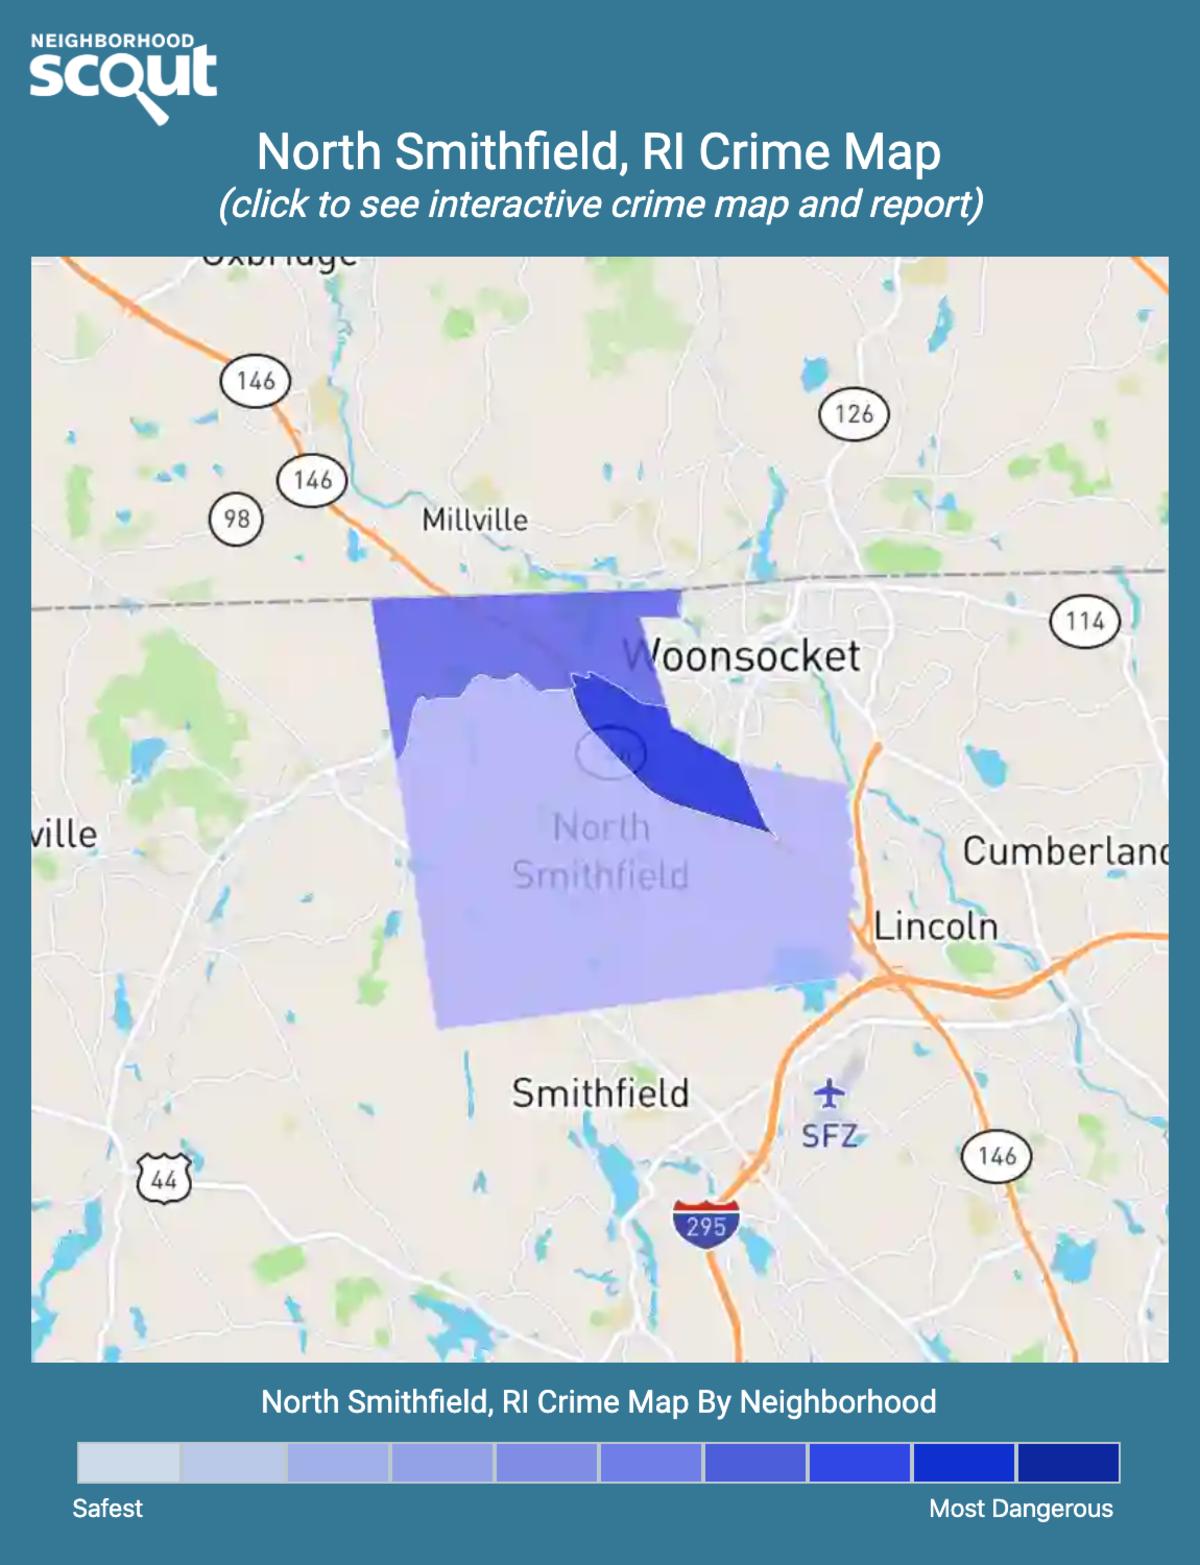 North Smithfield, Rhode Island crime map